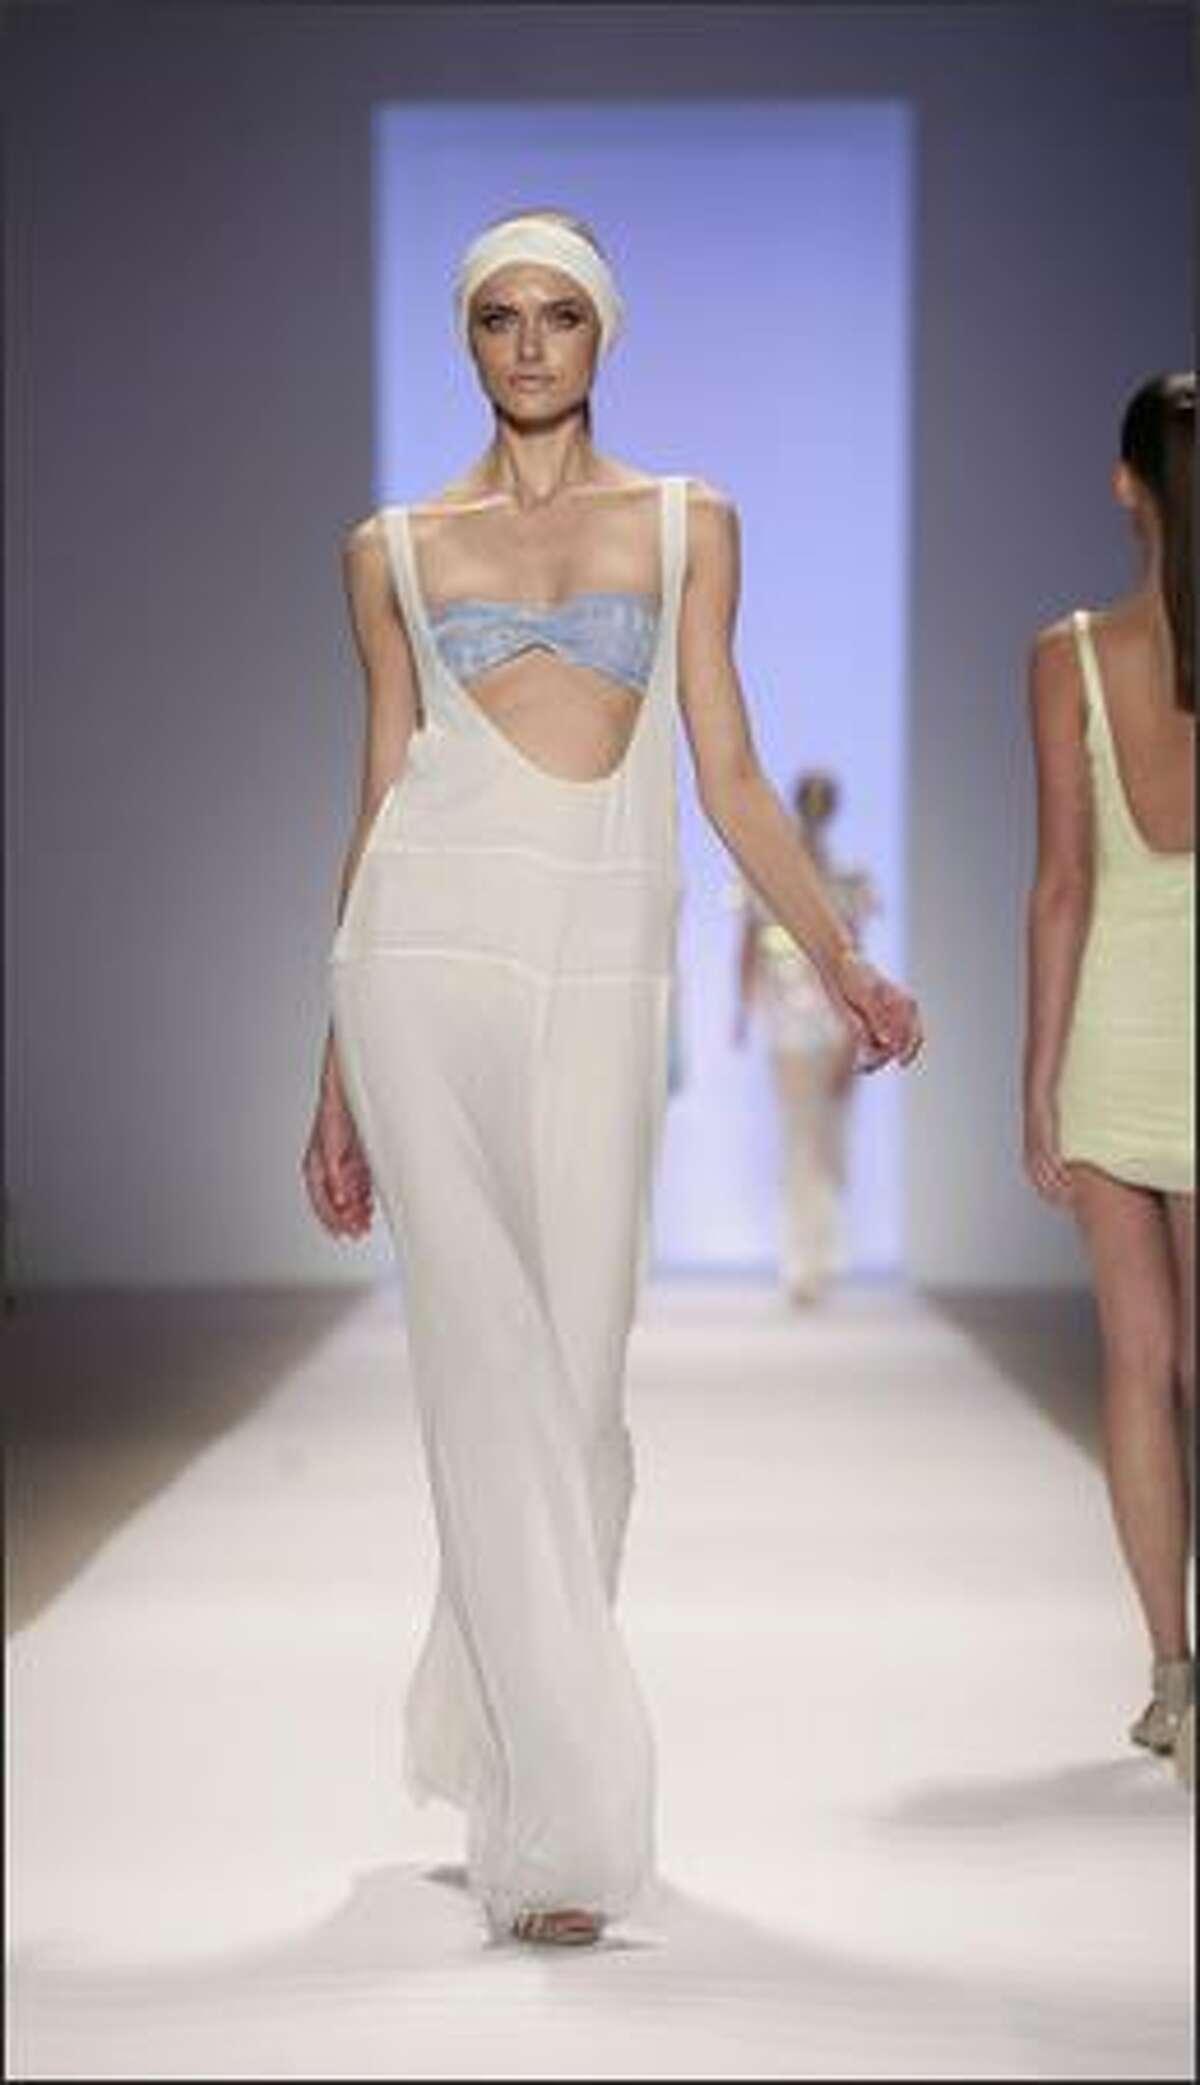 A model wears a creation by Erin Fetherston.